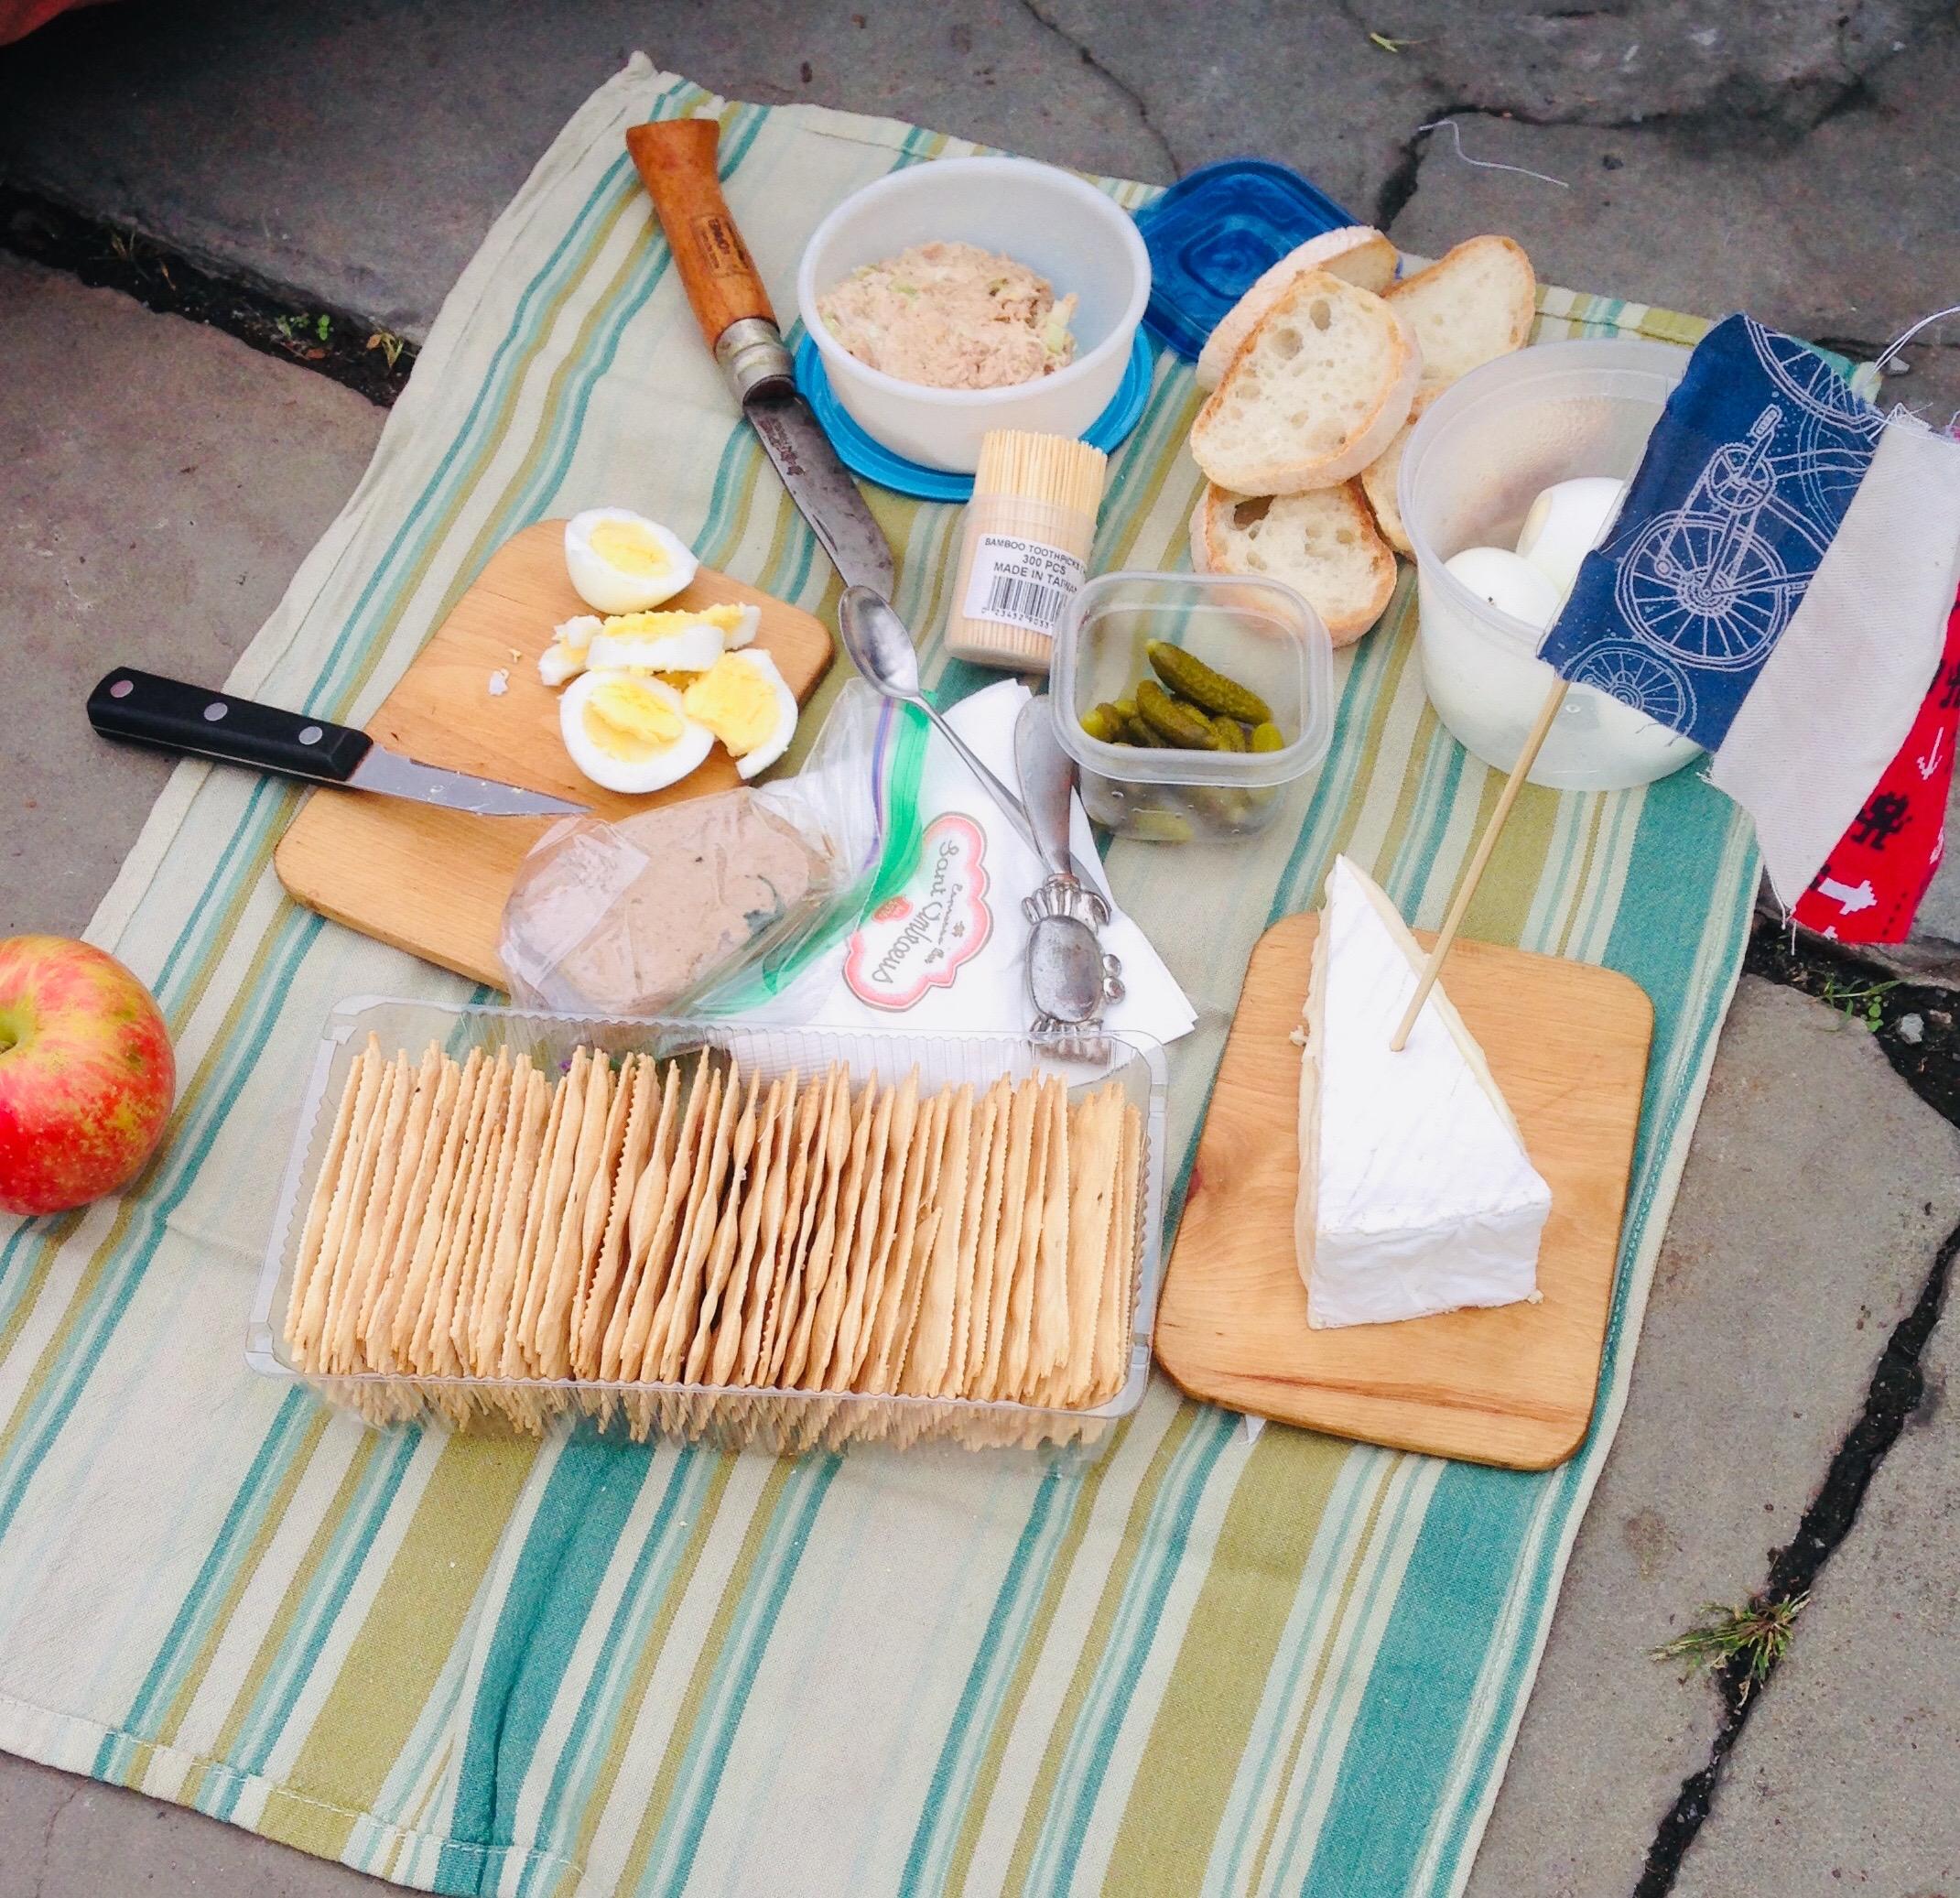 Cornichon, oefs, pâté, pain